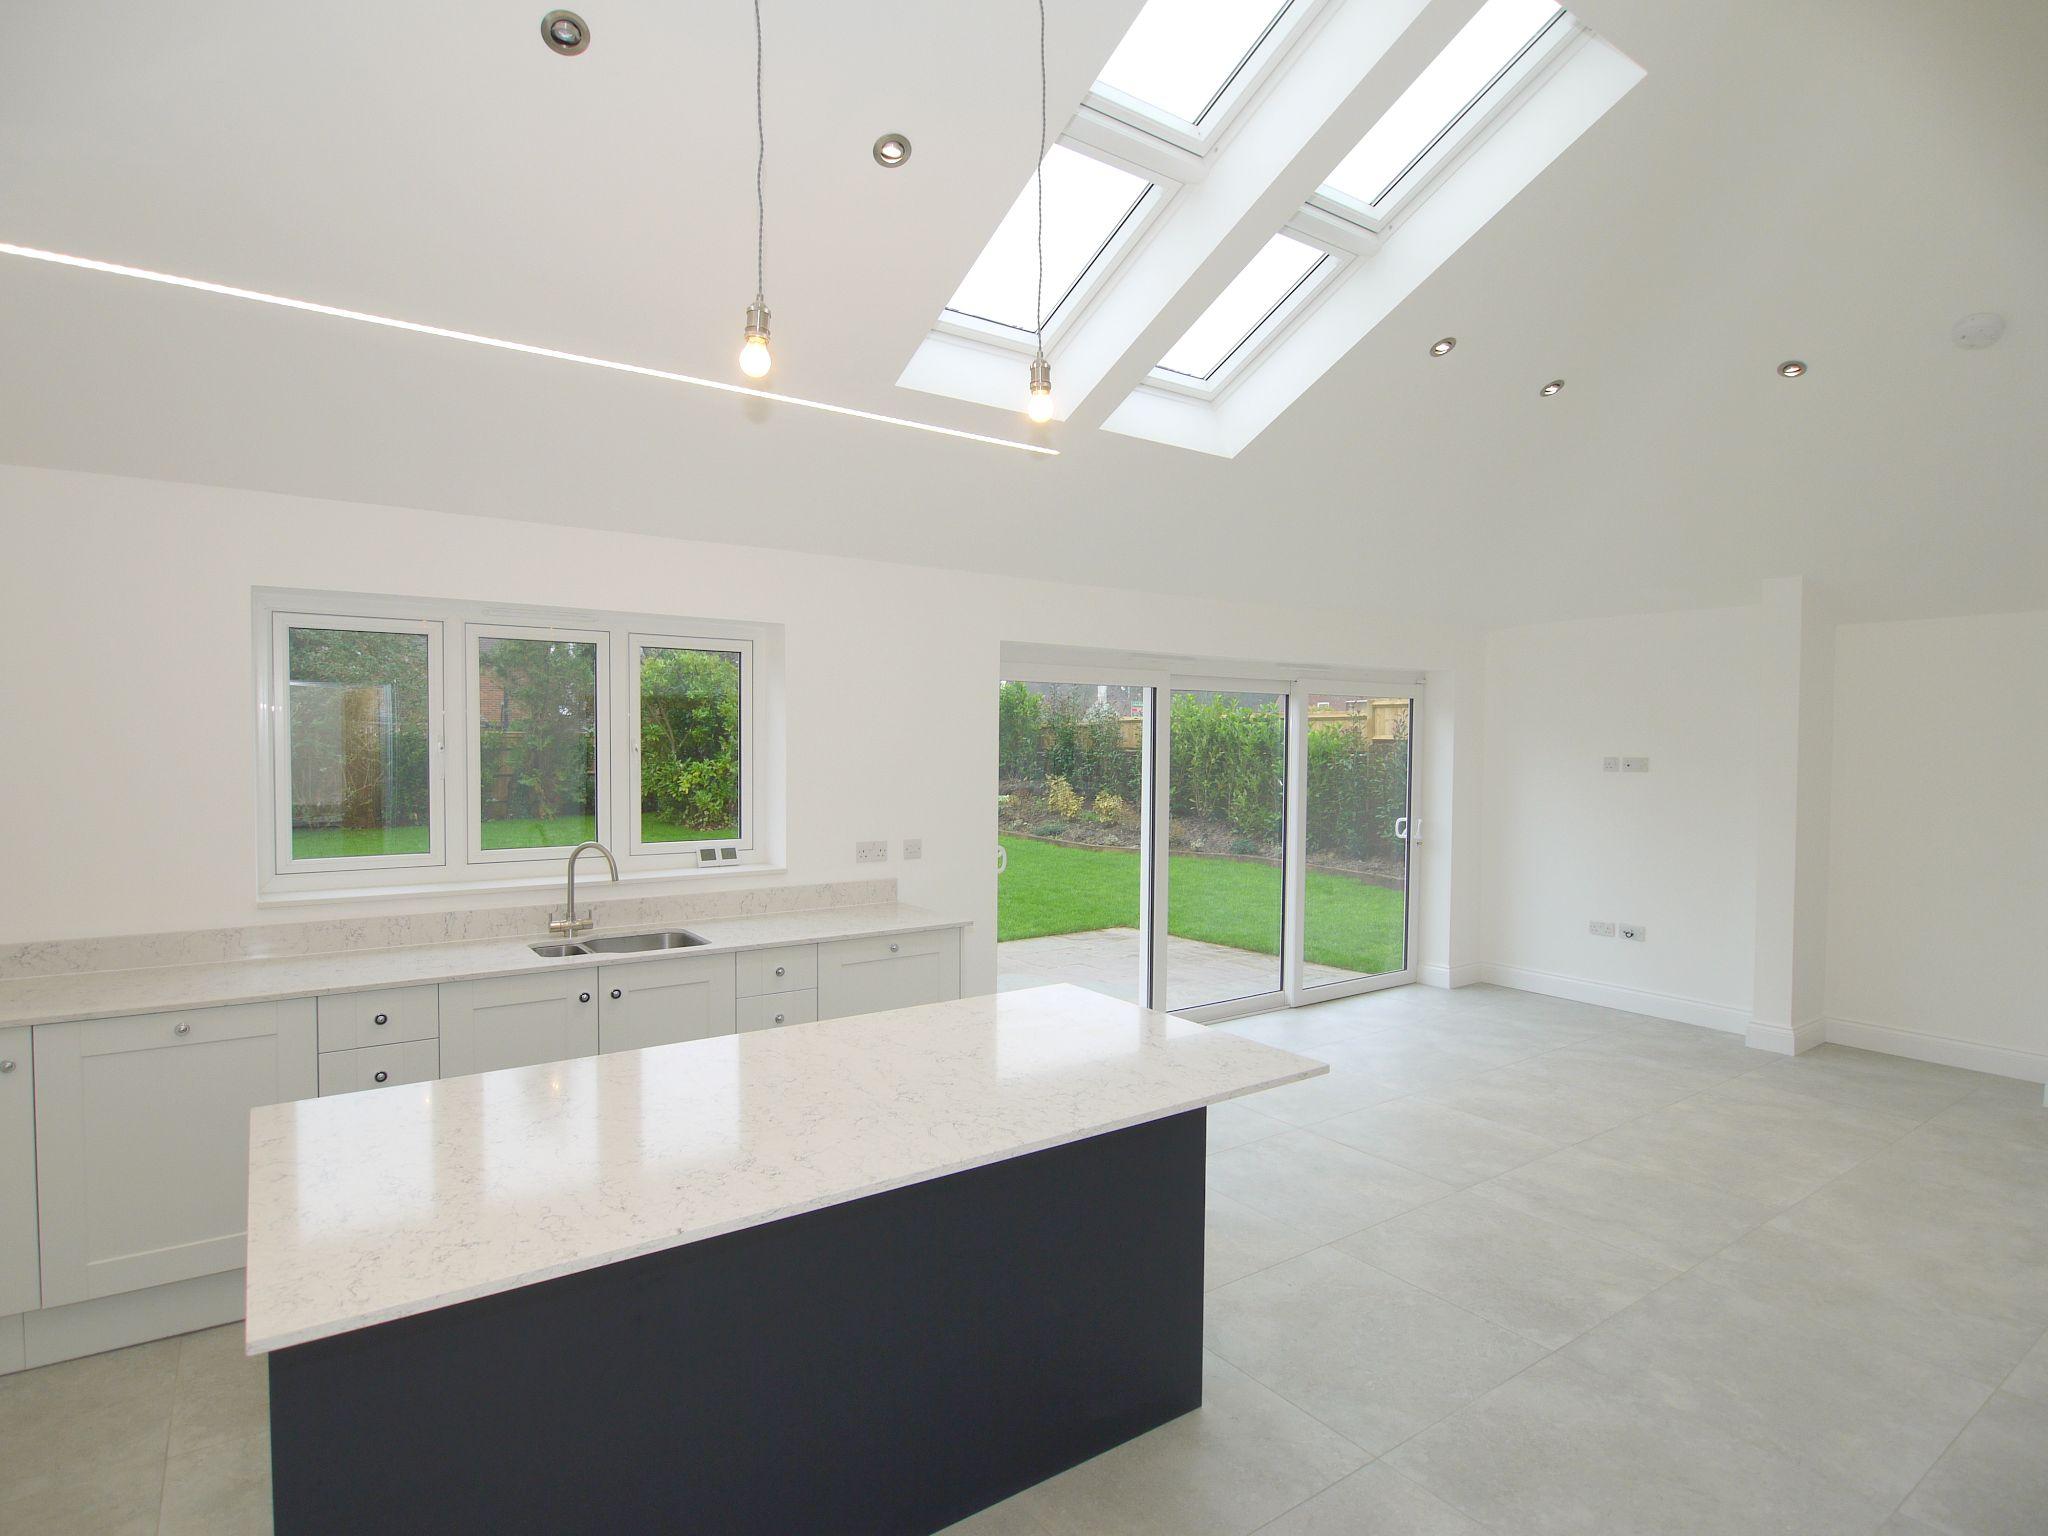 3 bedroom detached bungalow For Sale in Sevenoaks - Photograph 3